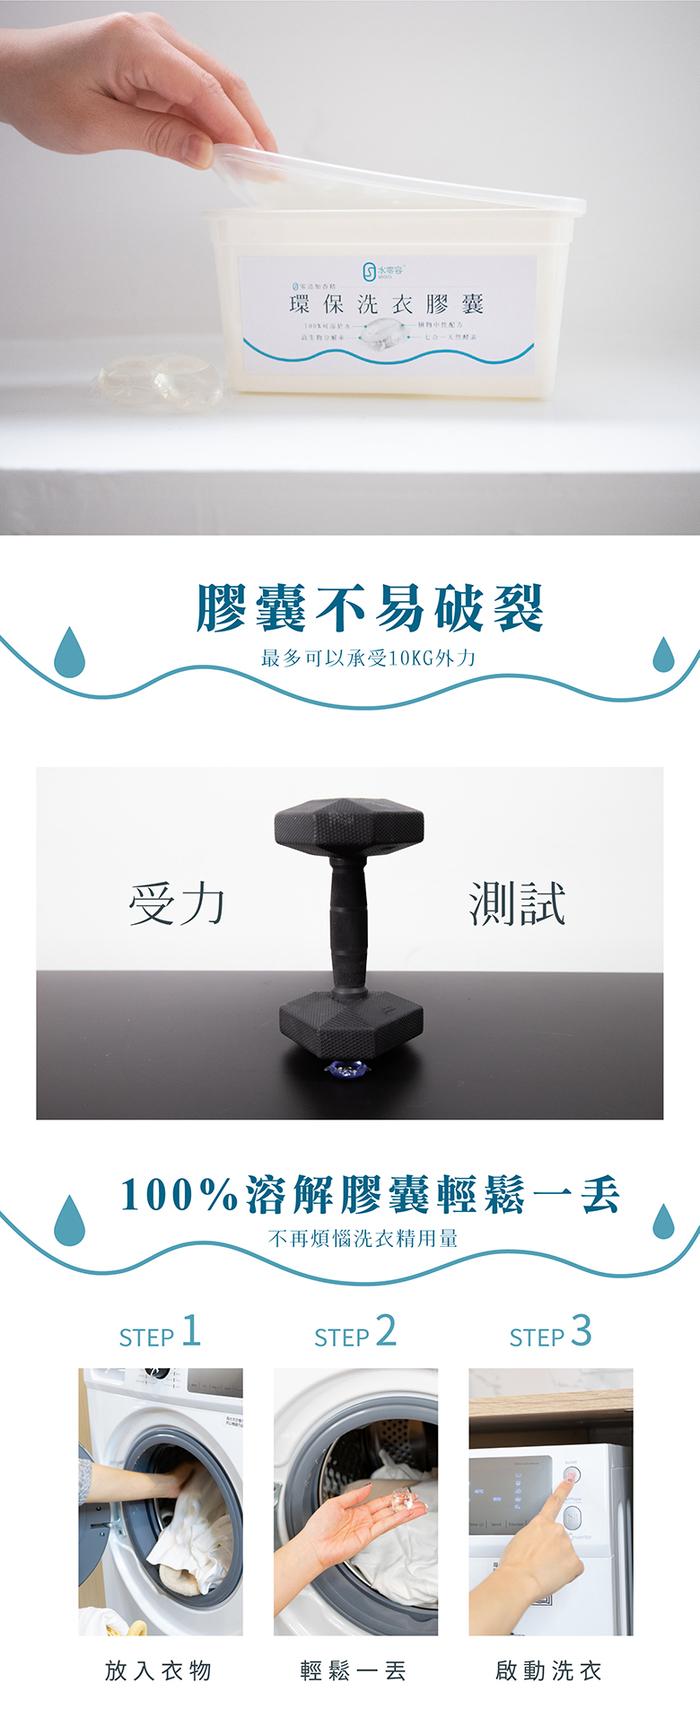 searo水零容超強七酵素環保洗衣膠囊